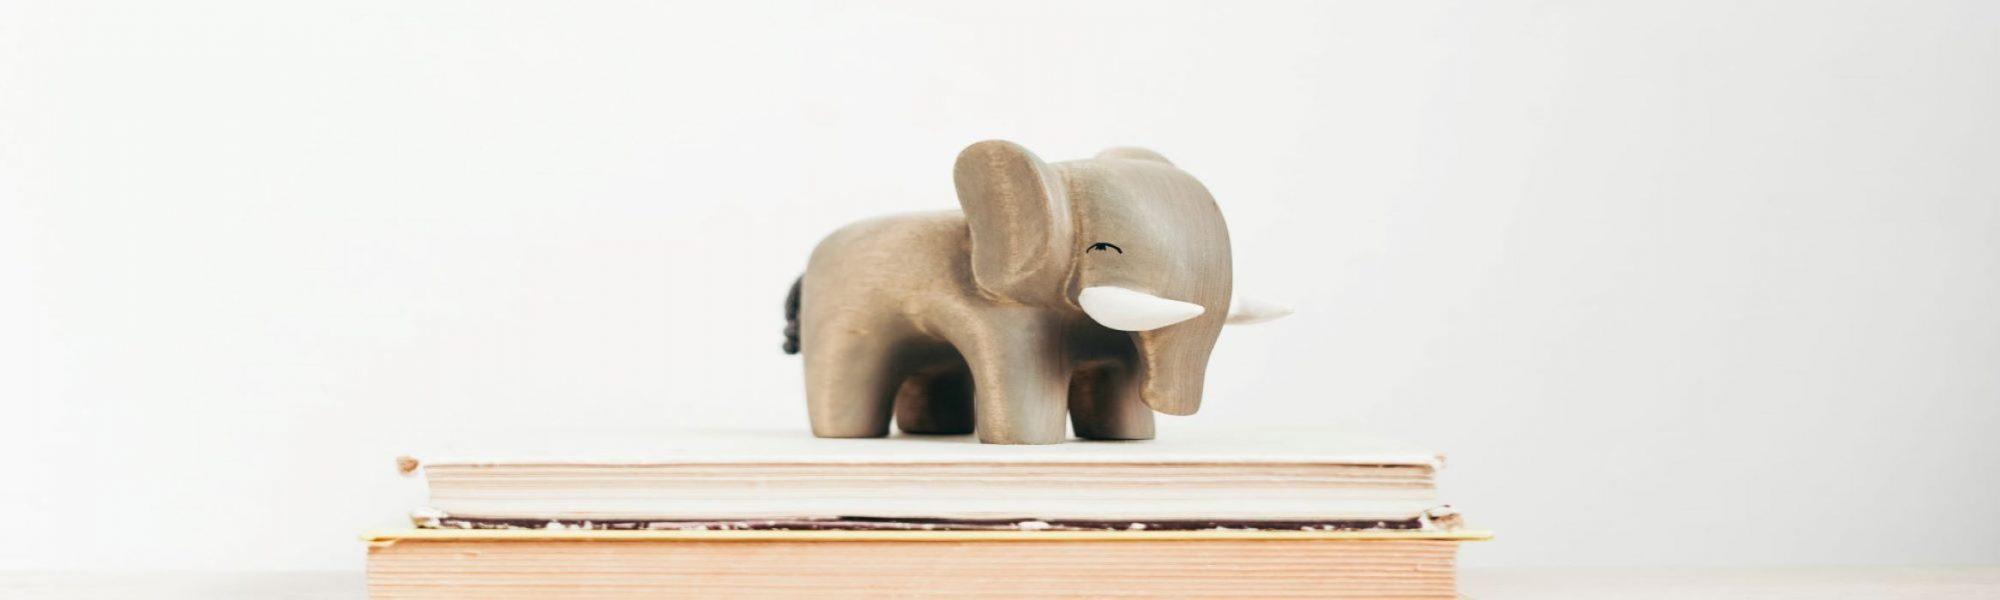 A Wandering Elephant